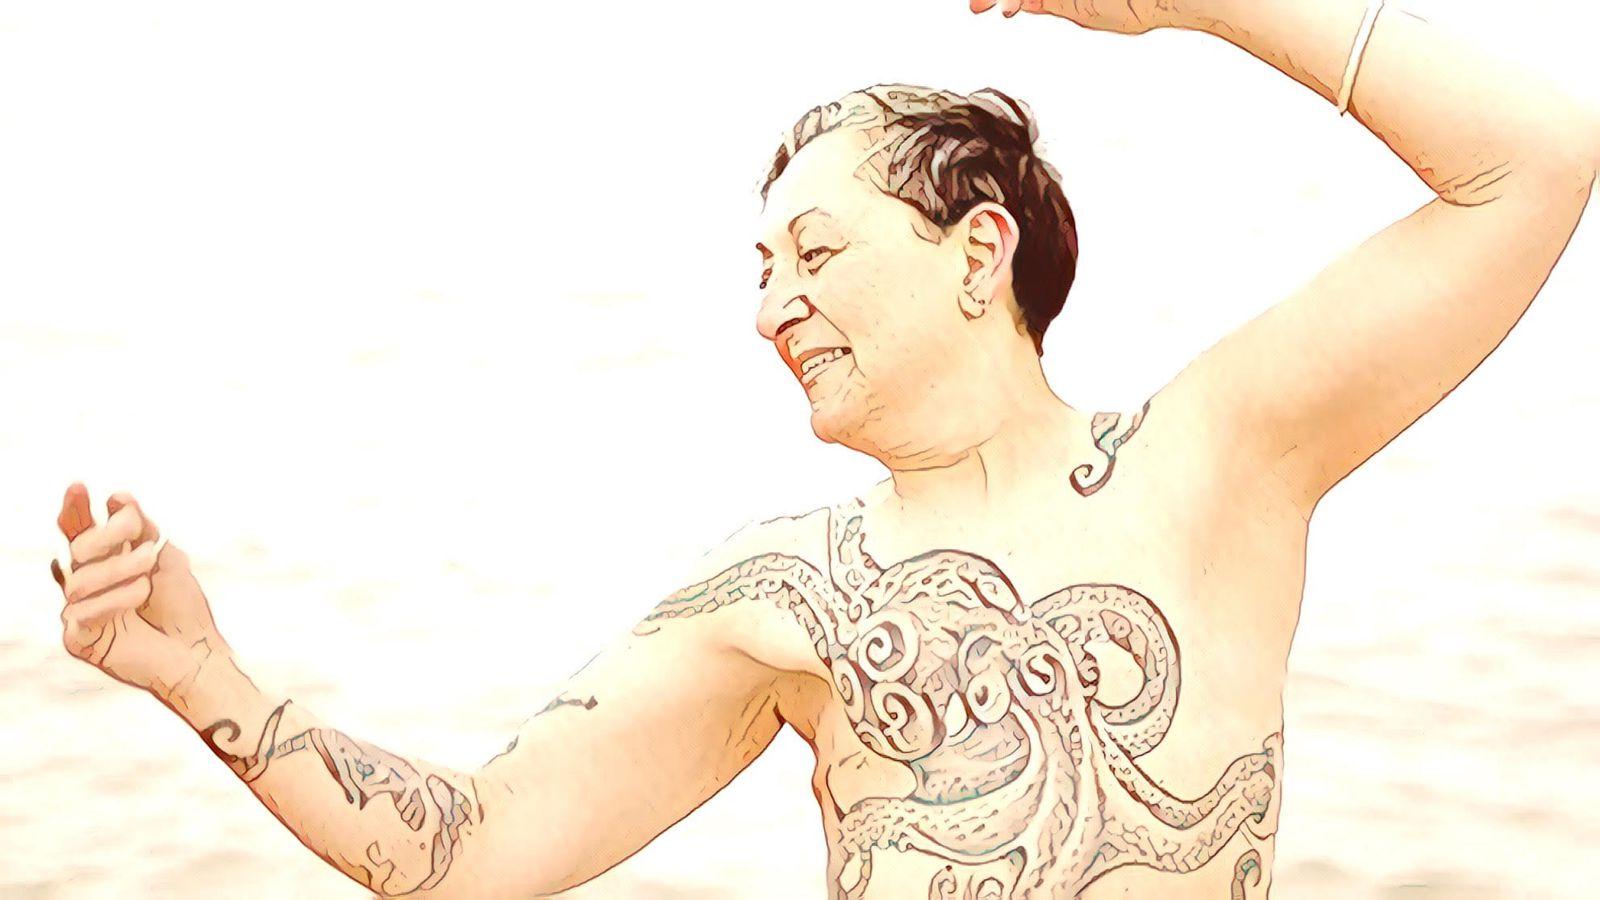 tatoo over scar Squadratlantica